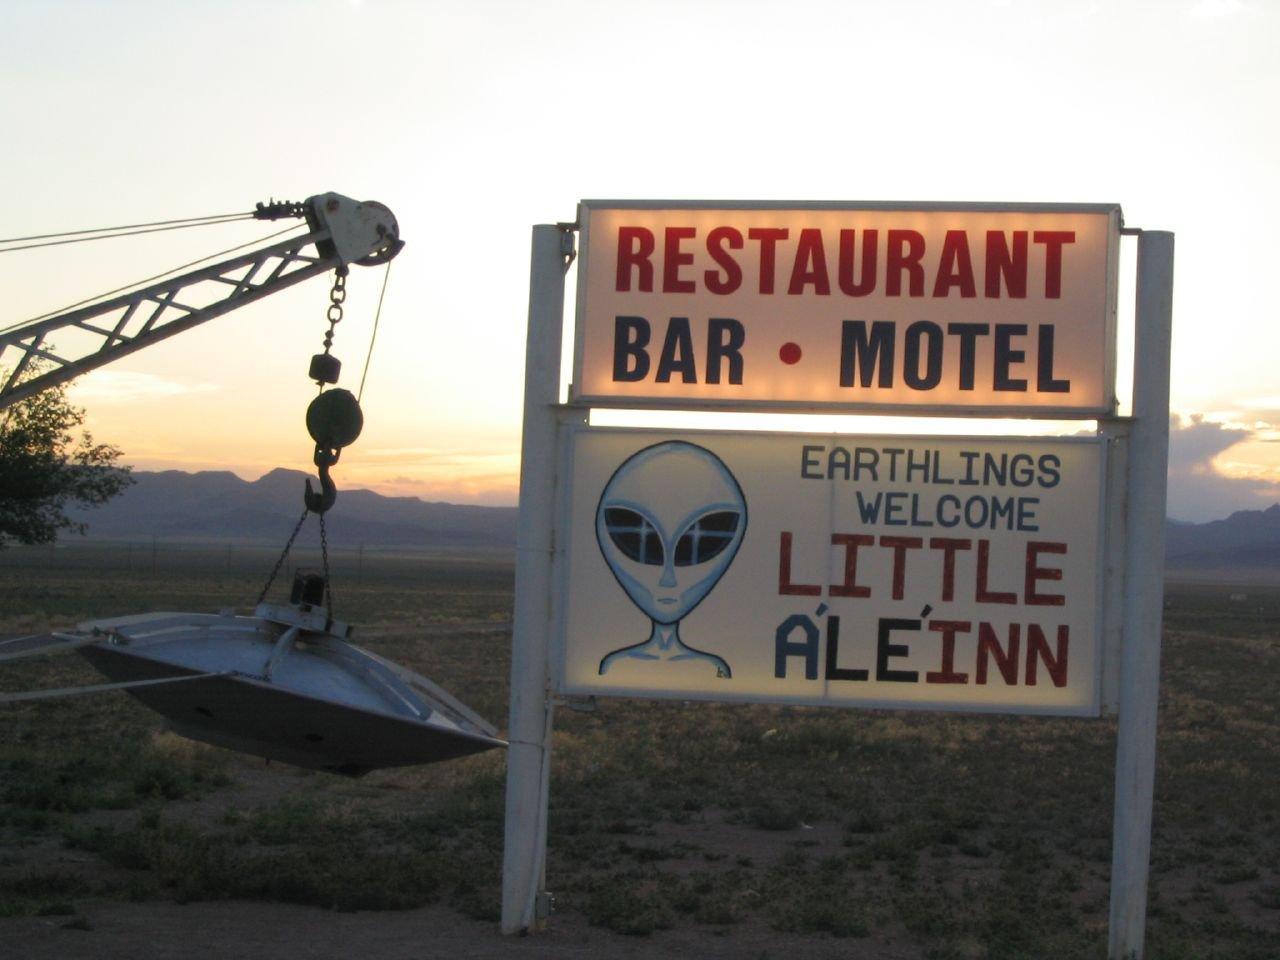 Little Al'e Inn | © Ken Lund/Flickr